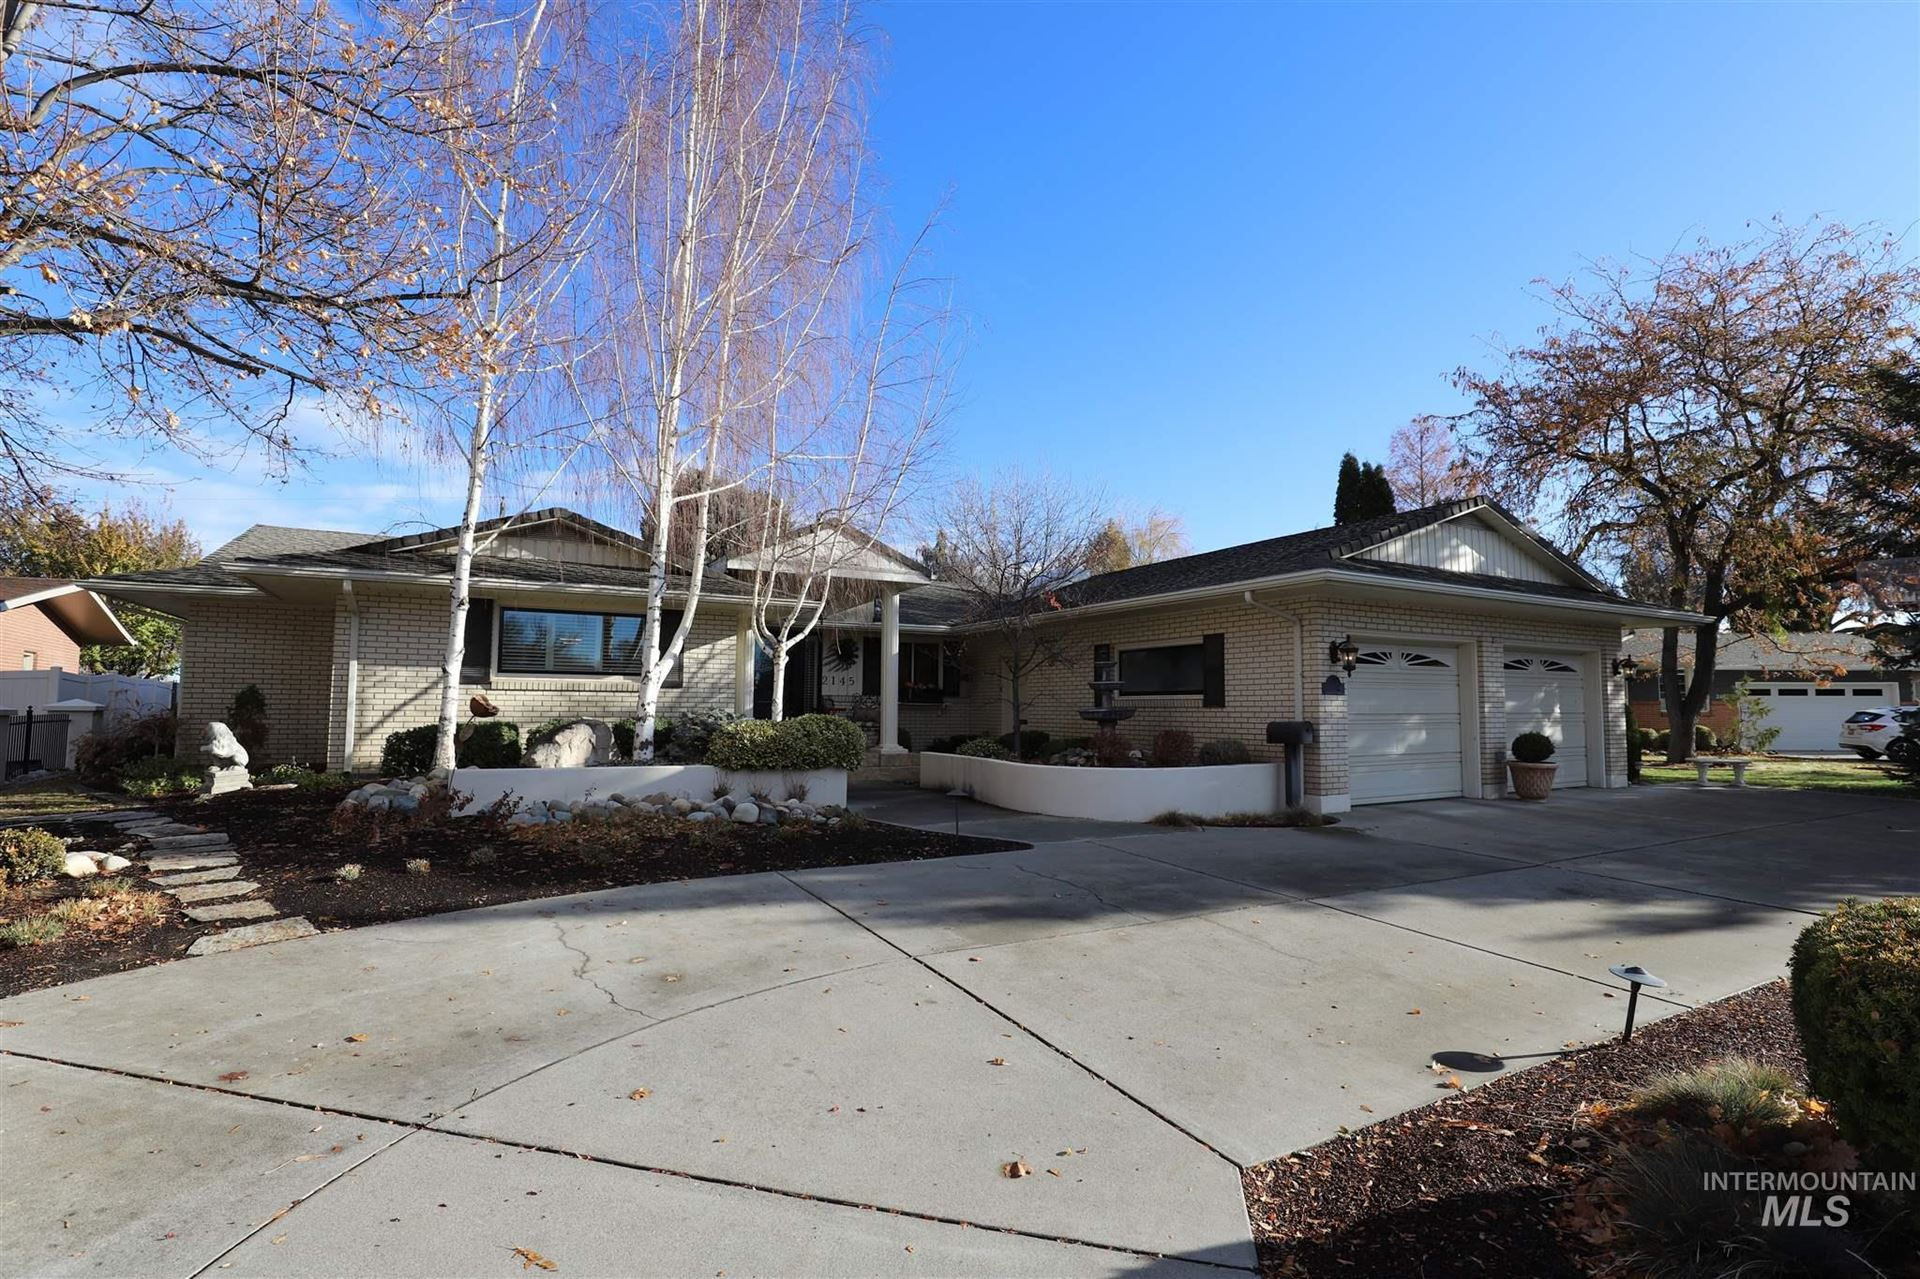 Photo of 2145 Hillcrest Dr., Twin Falls, ID 83301 (MLS # 98787451)